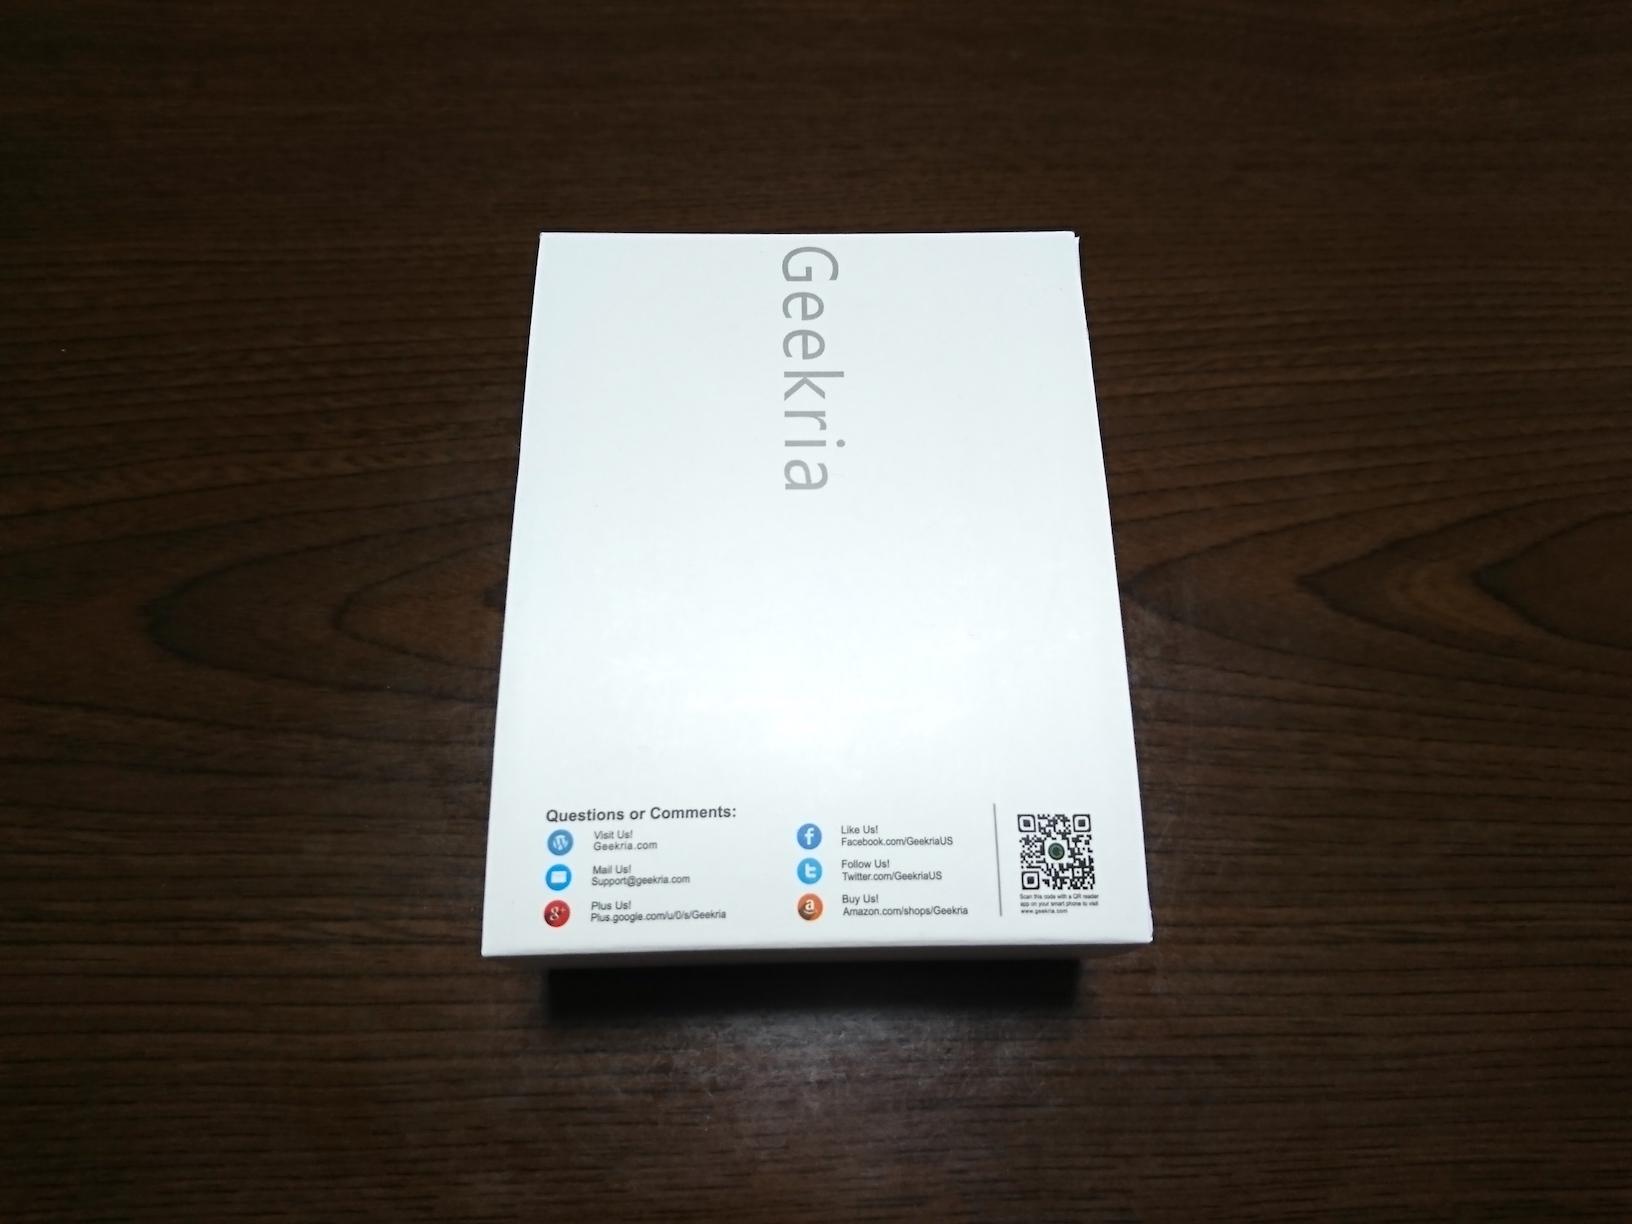 Geekria製イヤーパッドのパッケージ(正面)